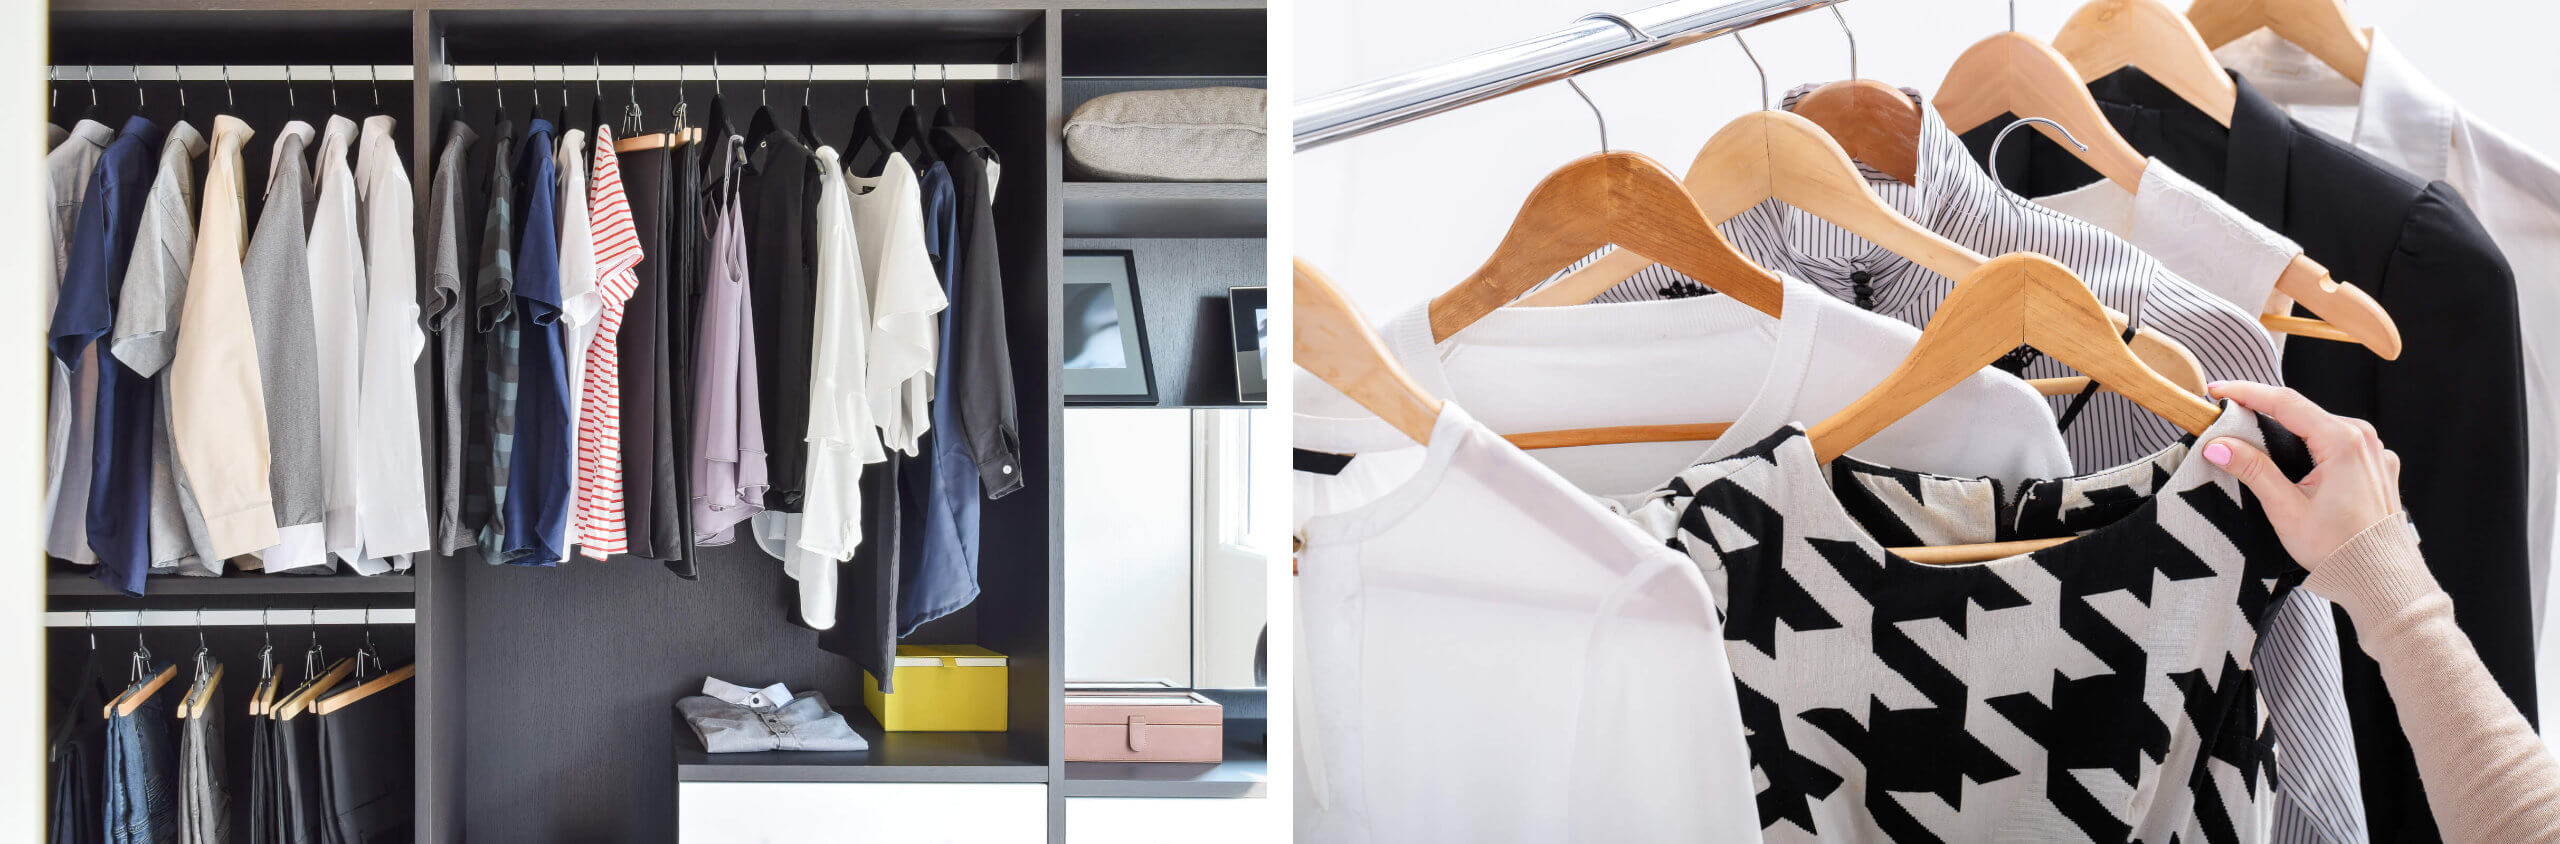 Joyful Hanging Closet Storage Using The KonMari Method Of Tidying